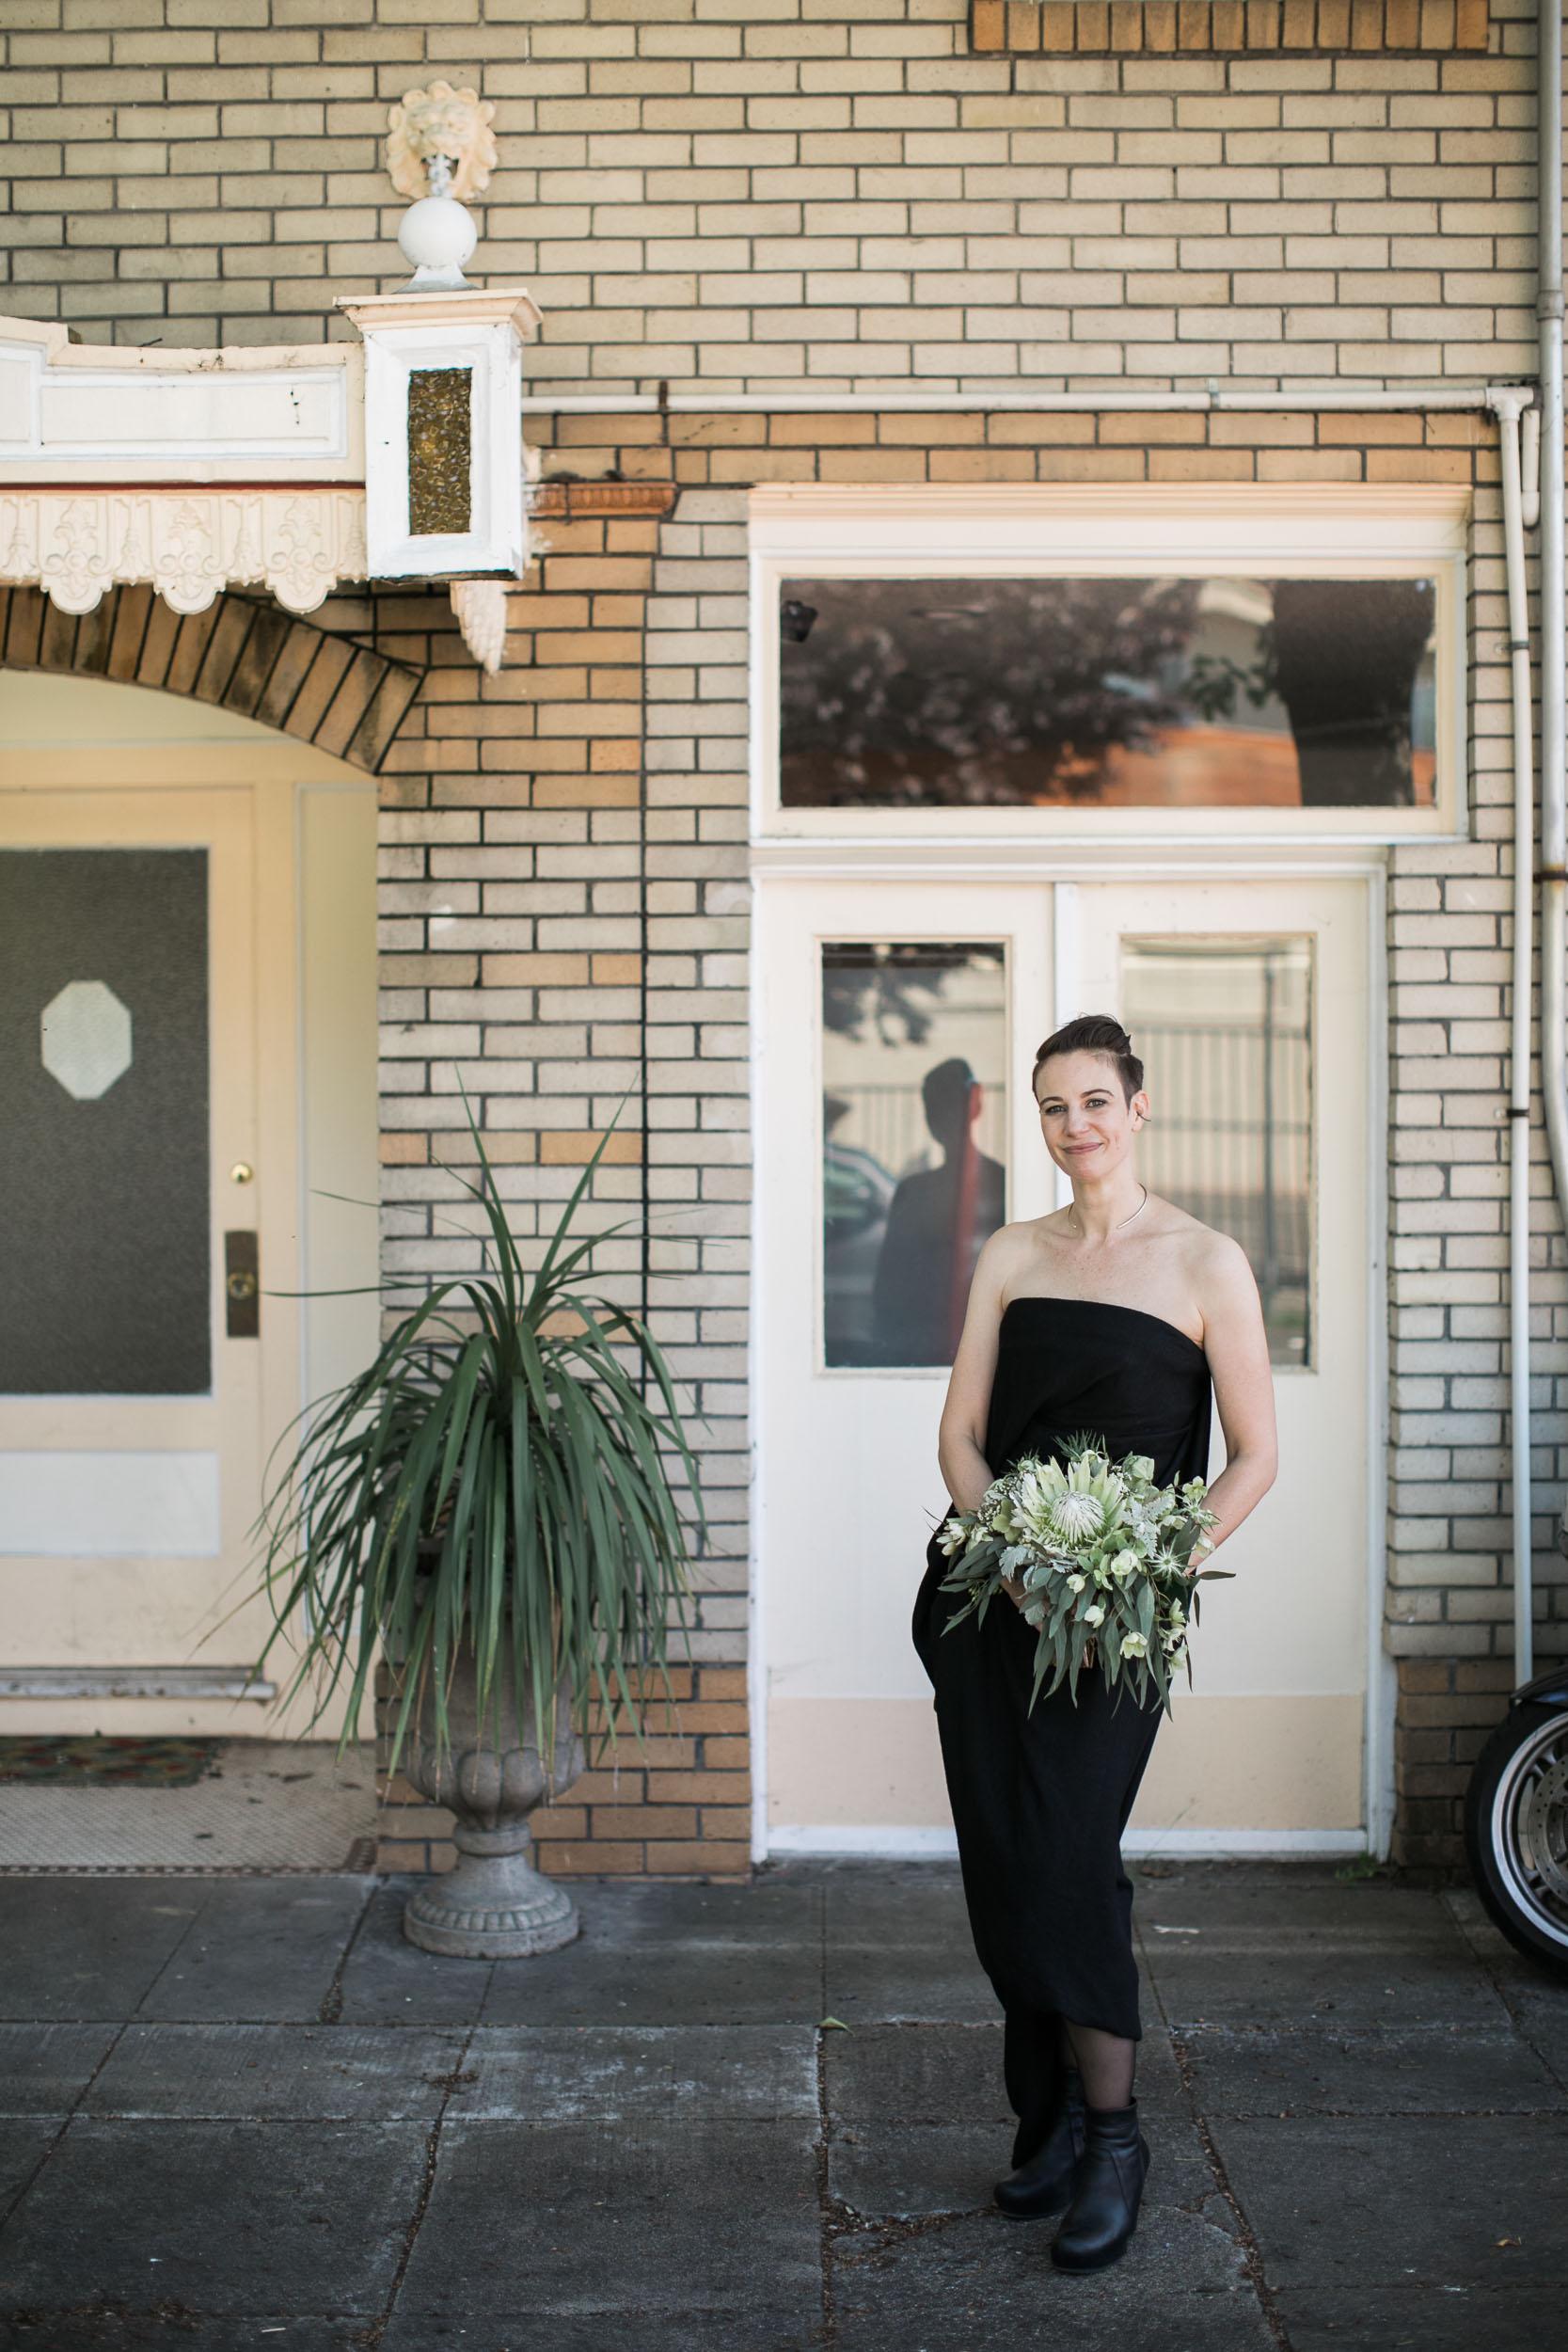 042717_A+Y_Oakland Wedding_Buena Lane Photography_2081.jpg